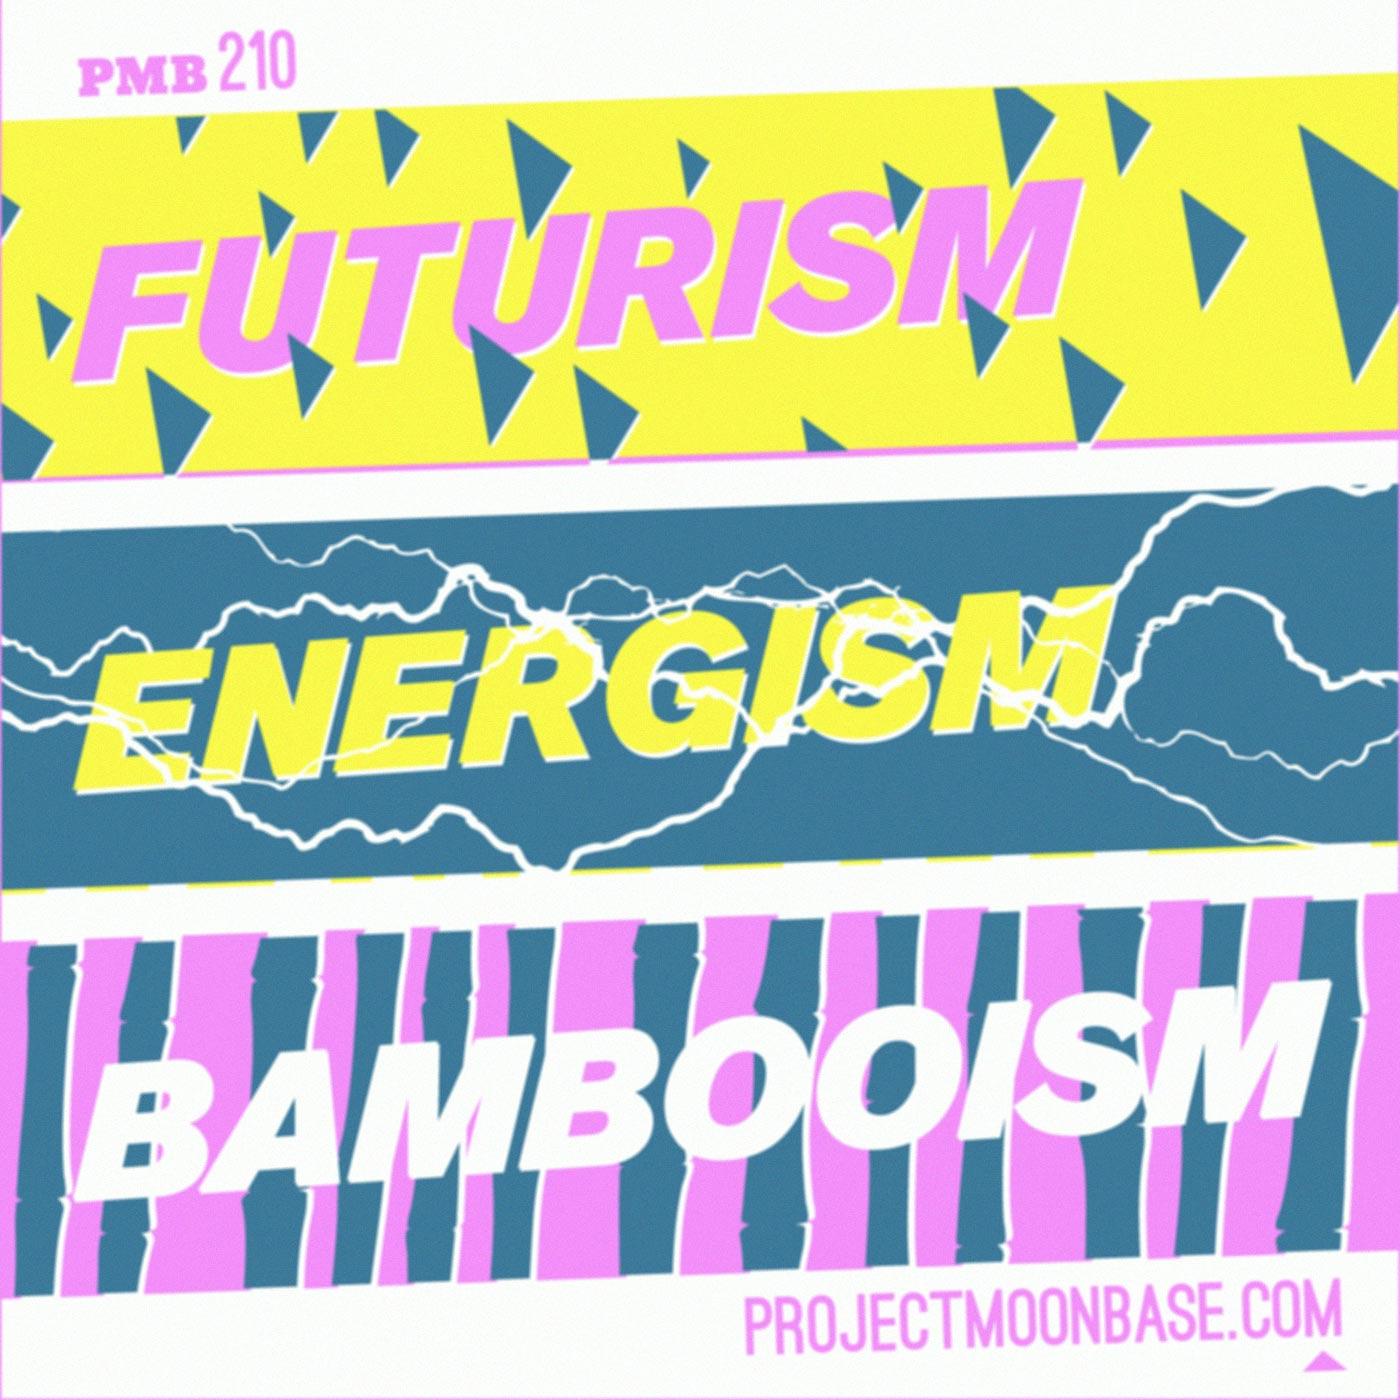 PMB210: Futurism, Energism, Bambooism